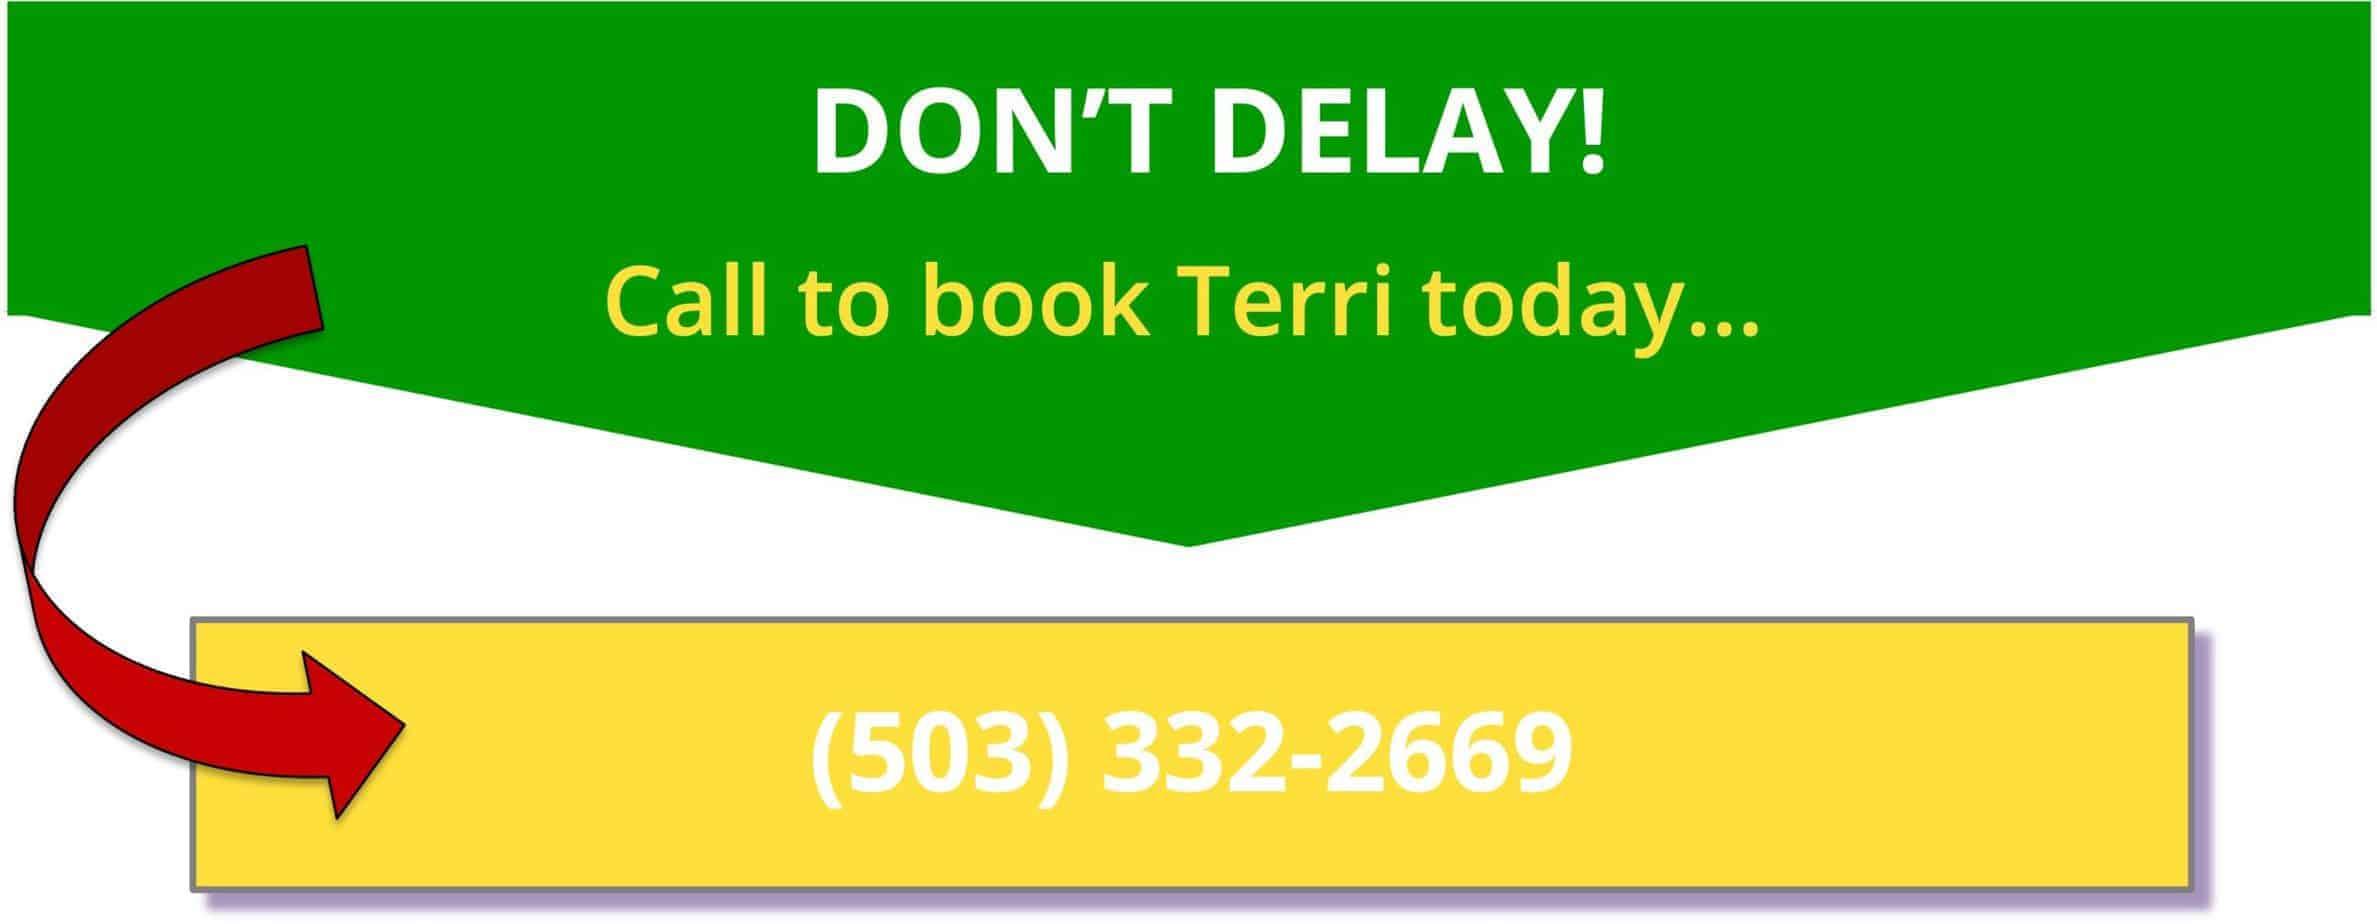 Book Terri Today